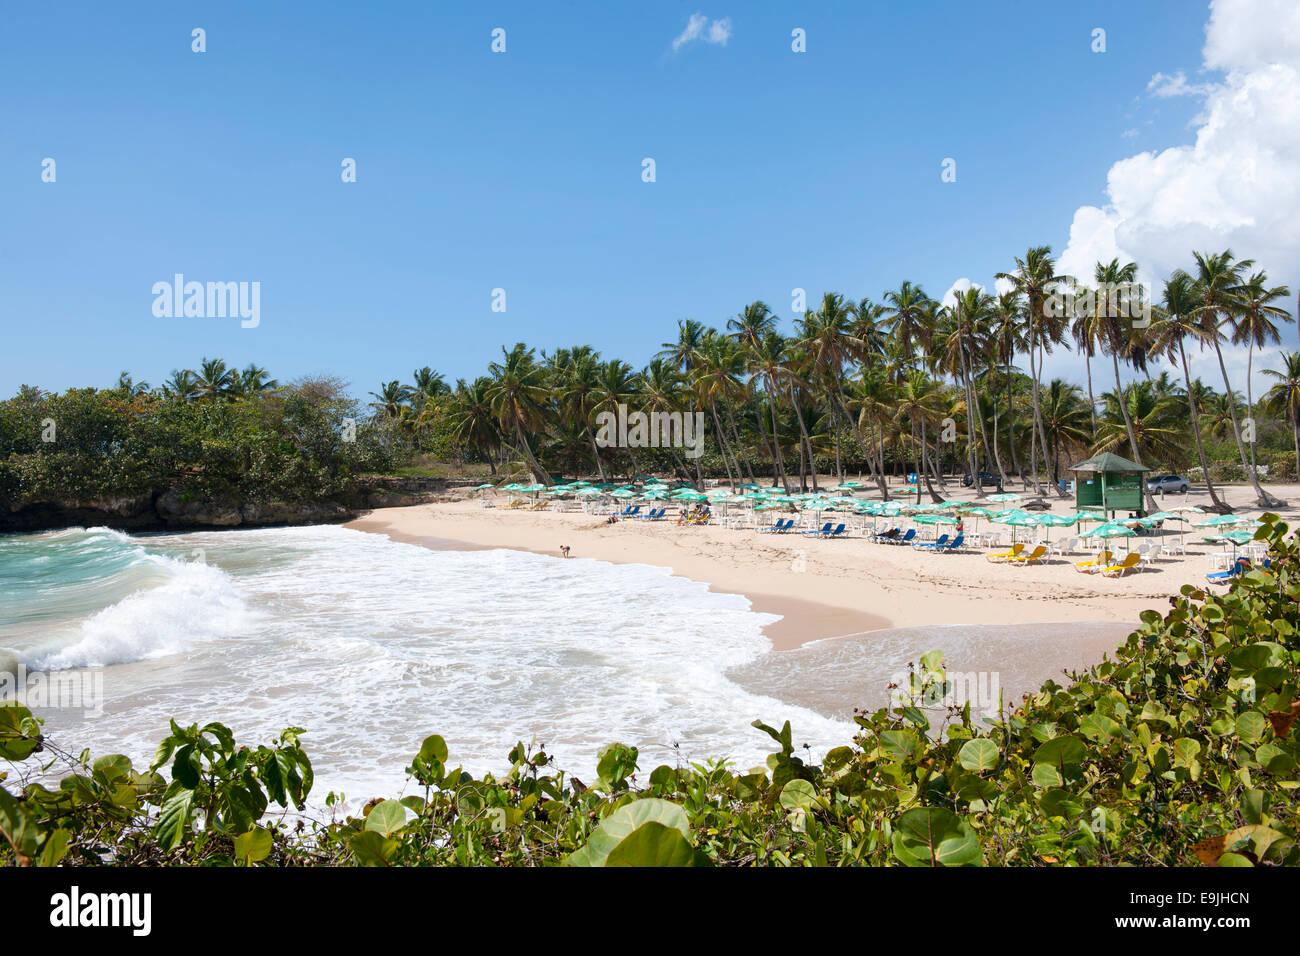 Dominikanische Republik, Osten, Juan Dolio, Playa Caribe Stock Photo